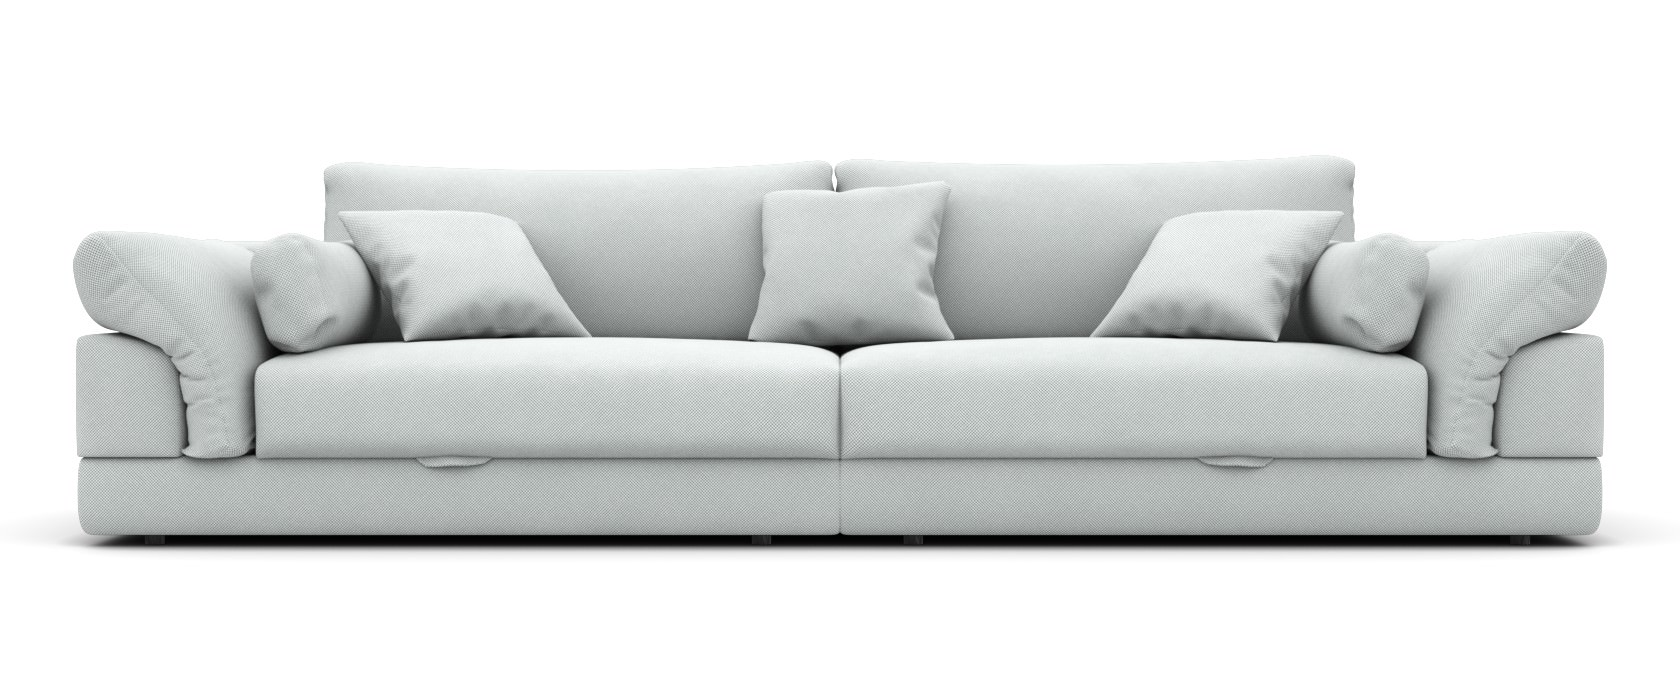 Трехместный диван Claudia - Pufetto